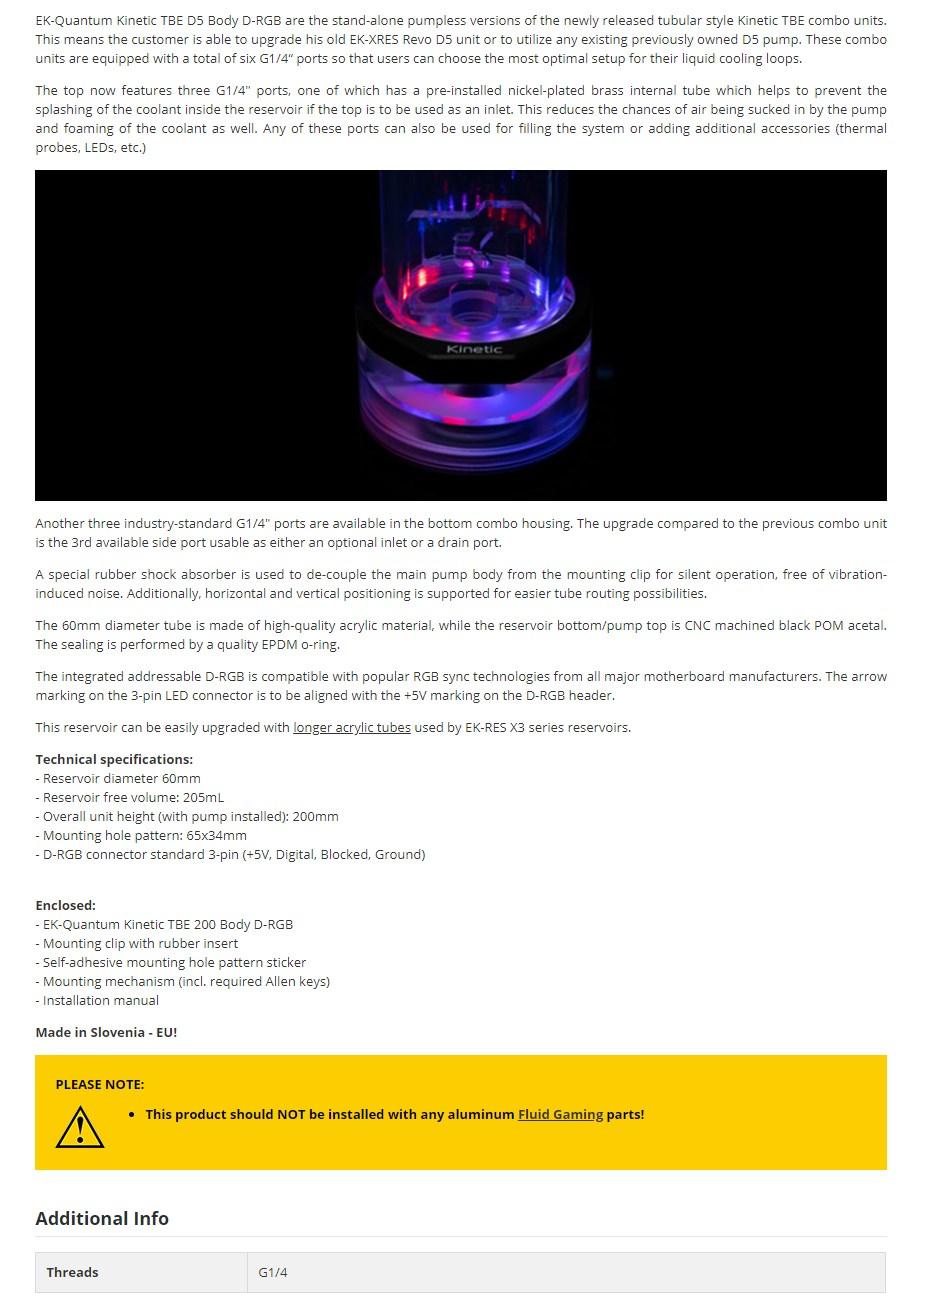 EKWB EK-Quantum Kinetic TBE 200 D5 Body D-RGB Reservoir - Acetal